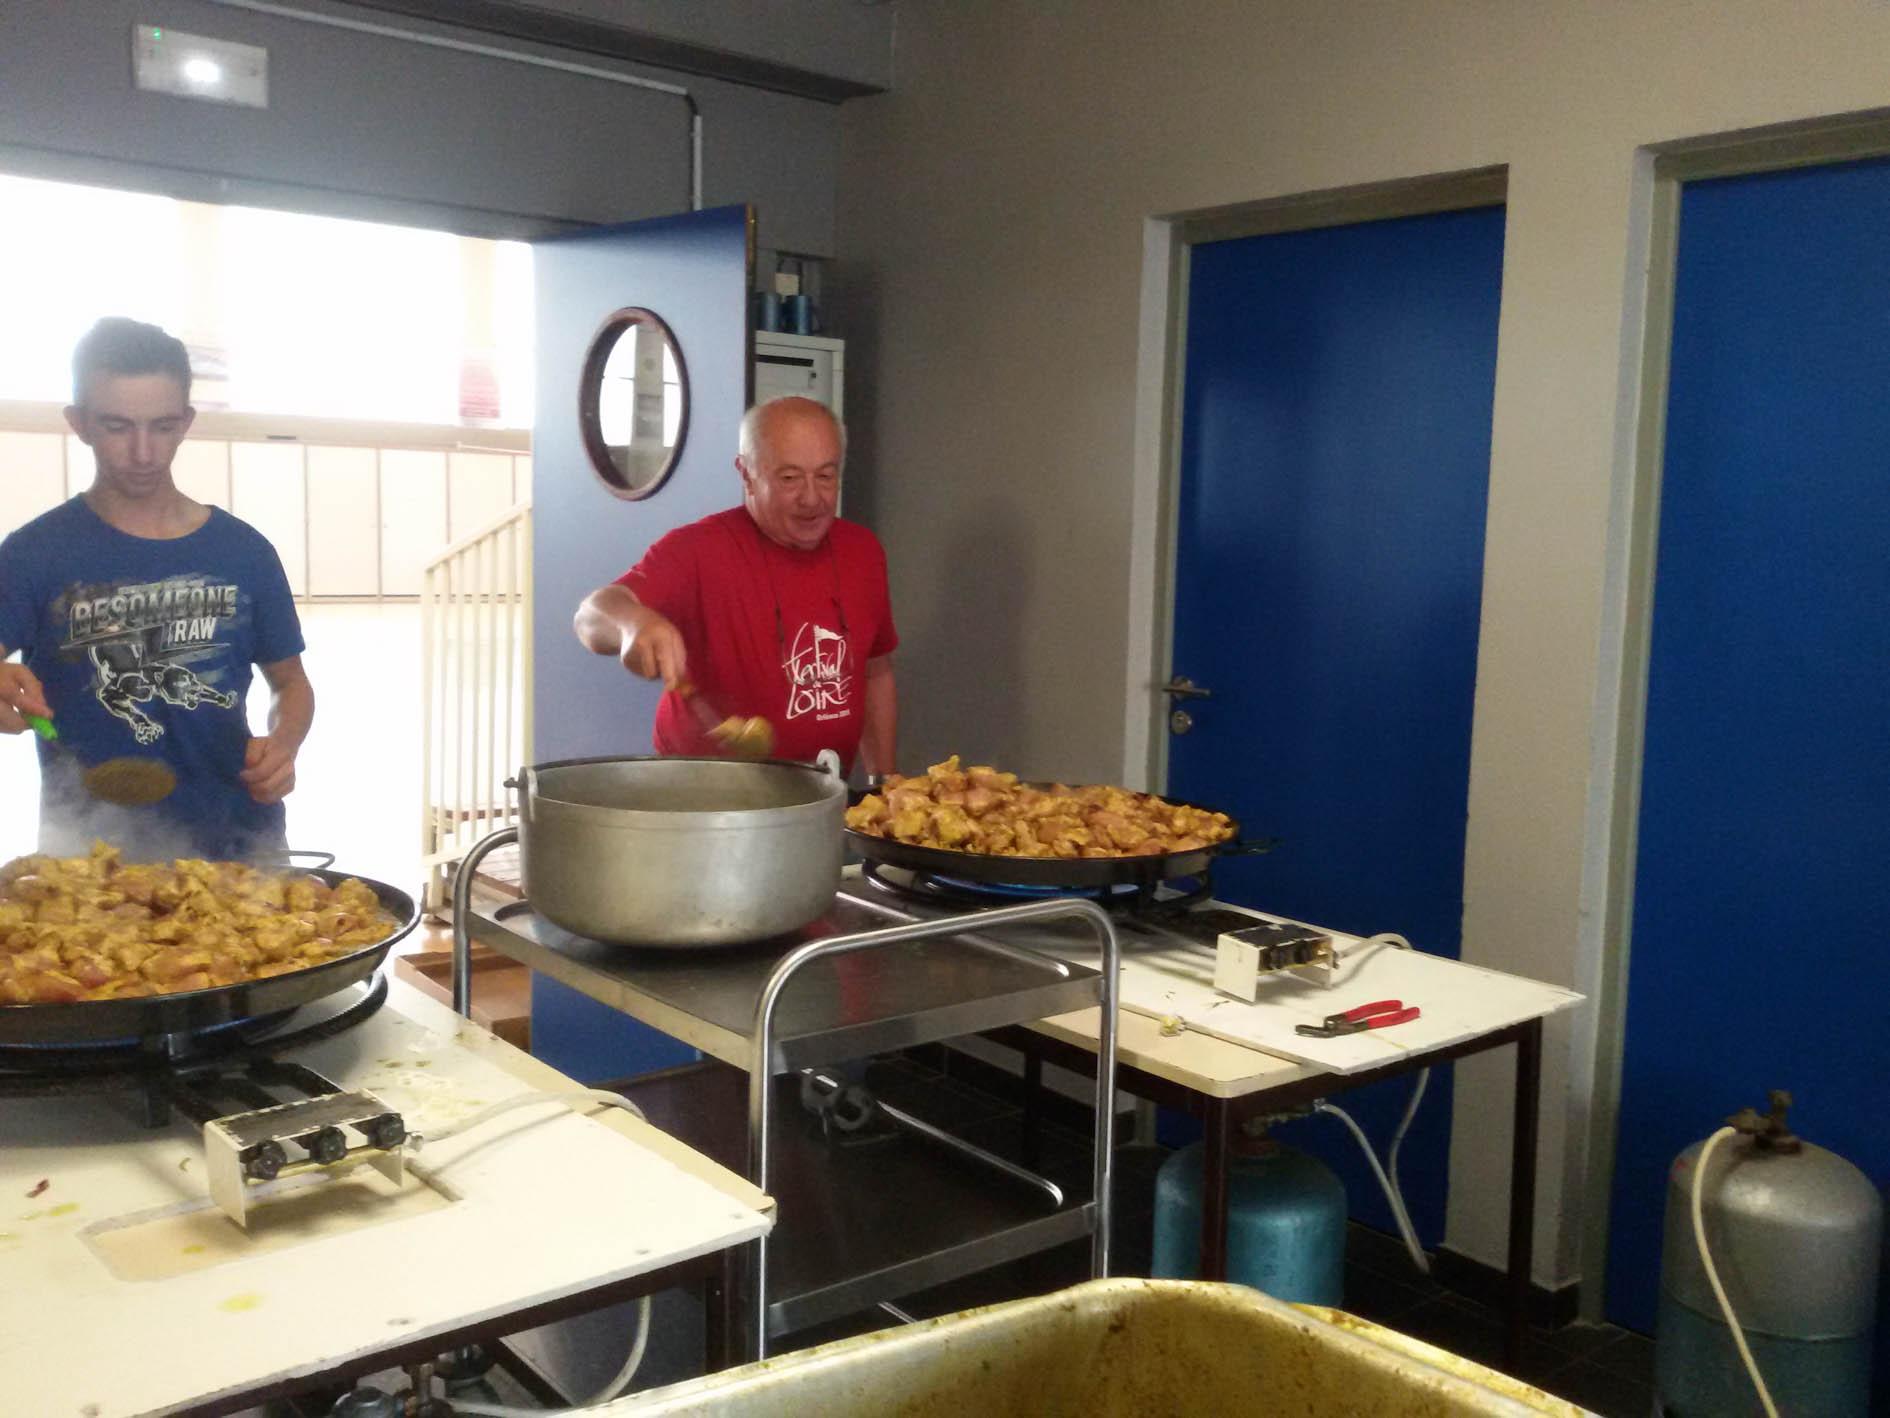 Guy et son apprenti cuisinier Cyril